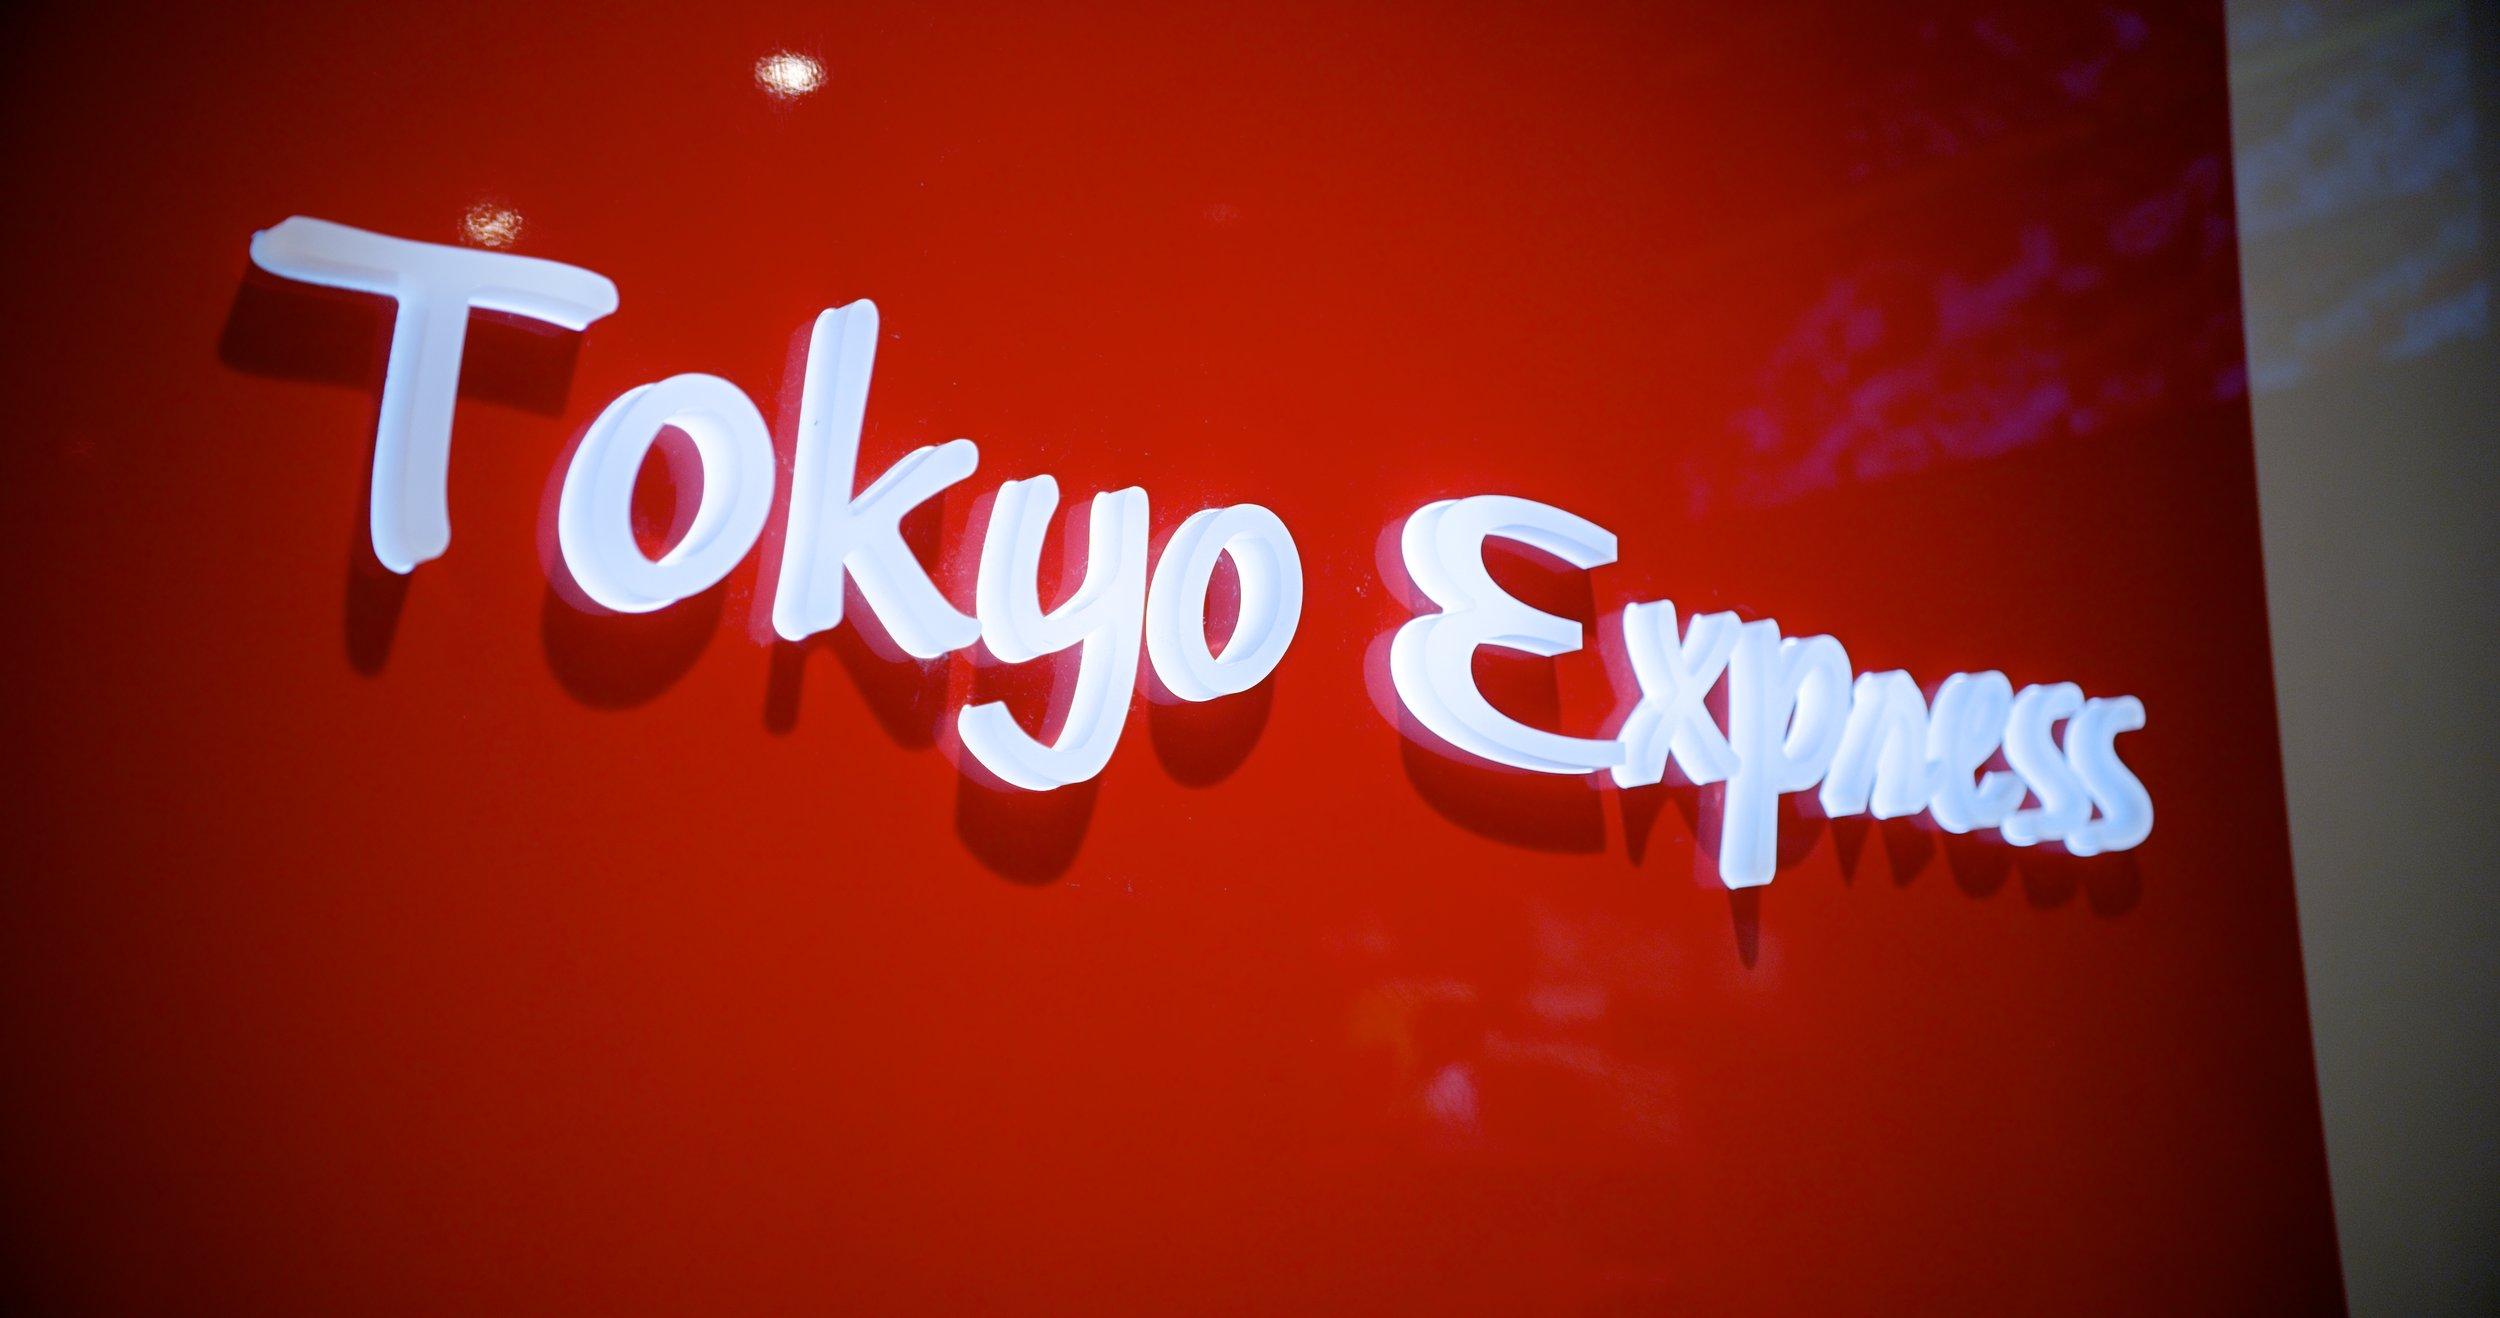 Tokyo Express - 4.jpg